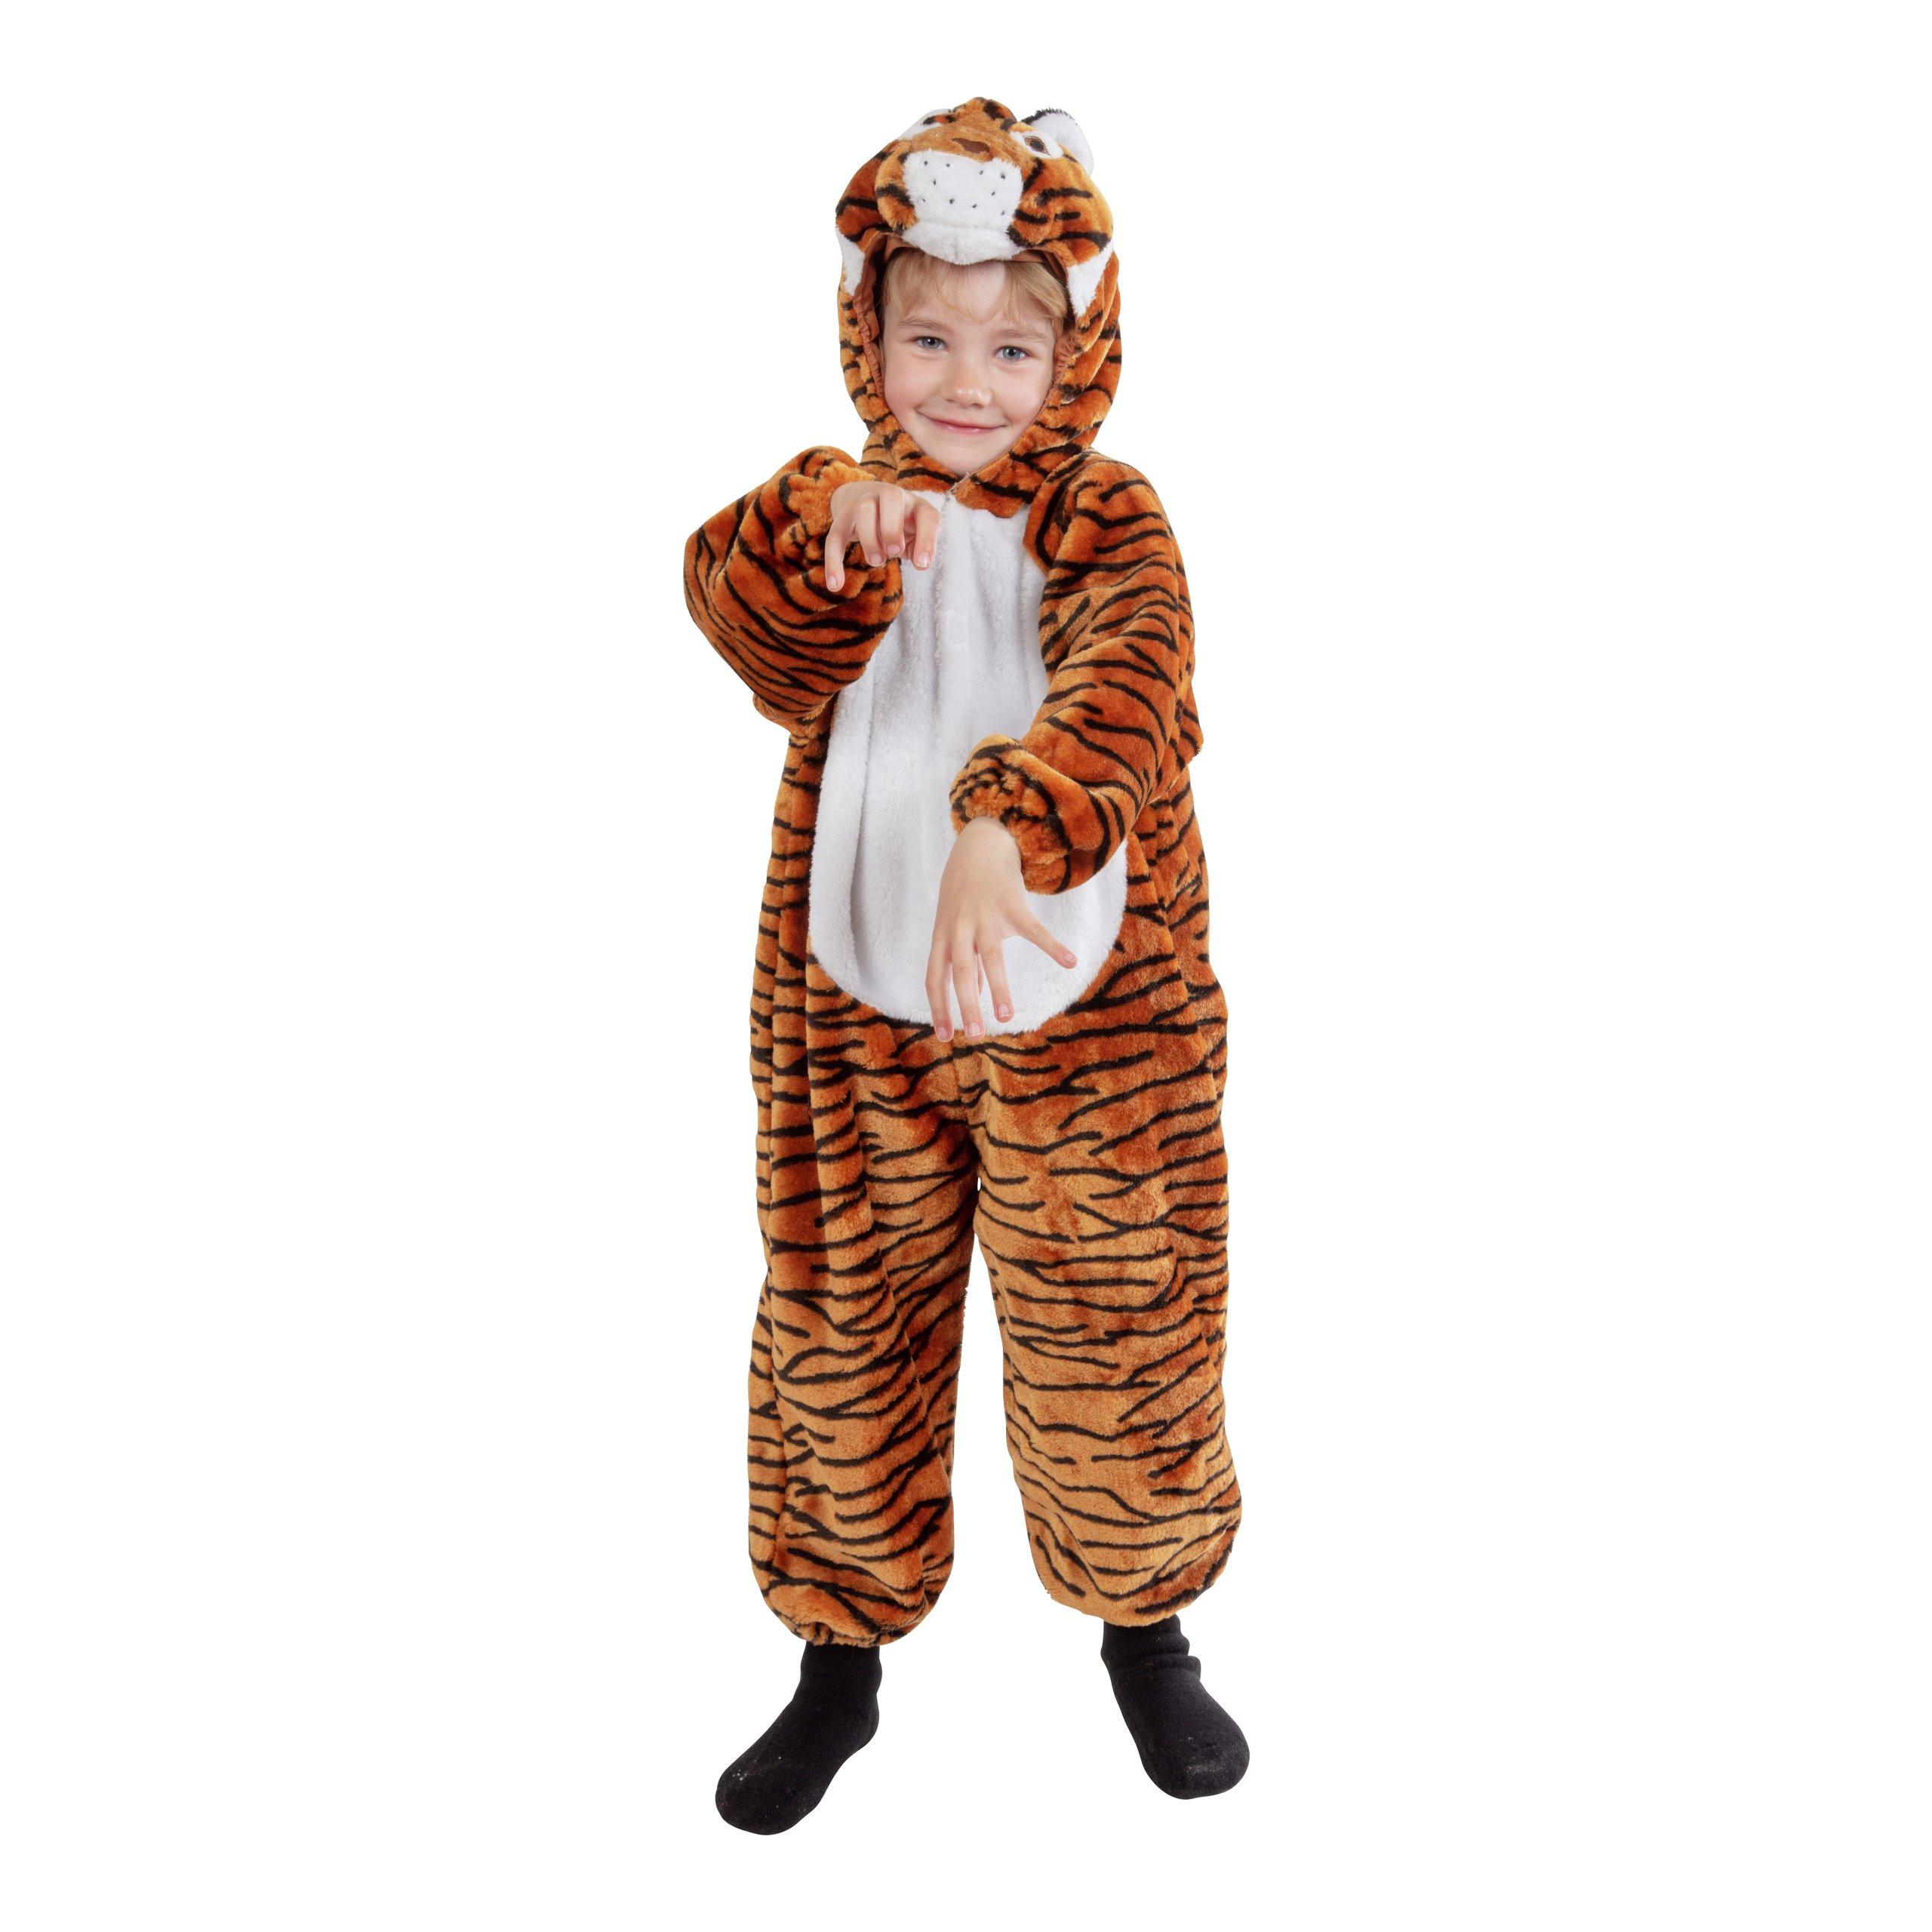 KOSTYME TIGER 104-103386